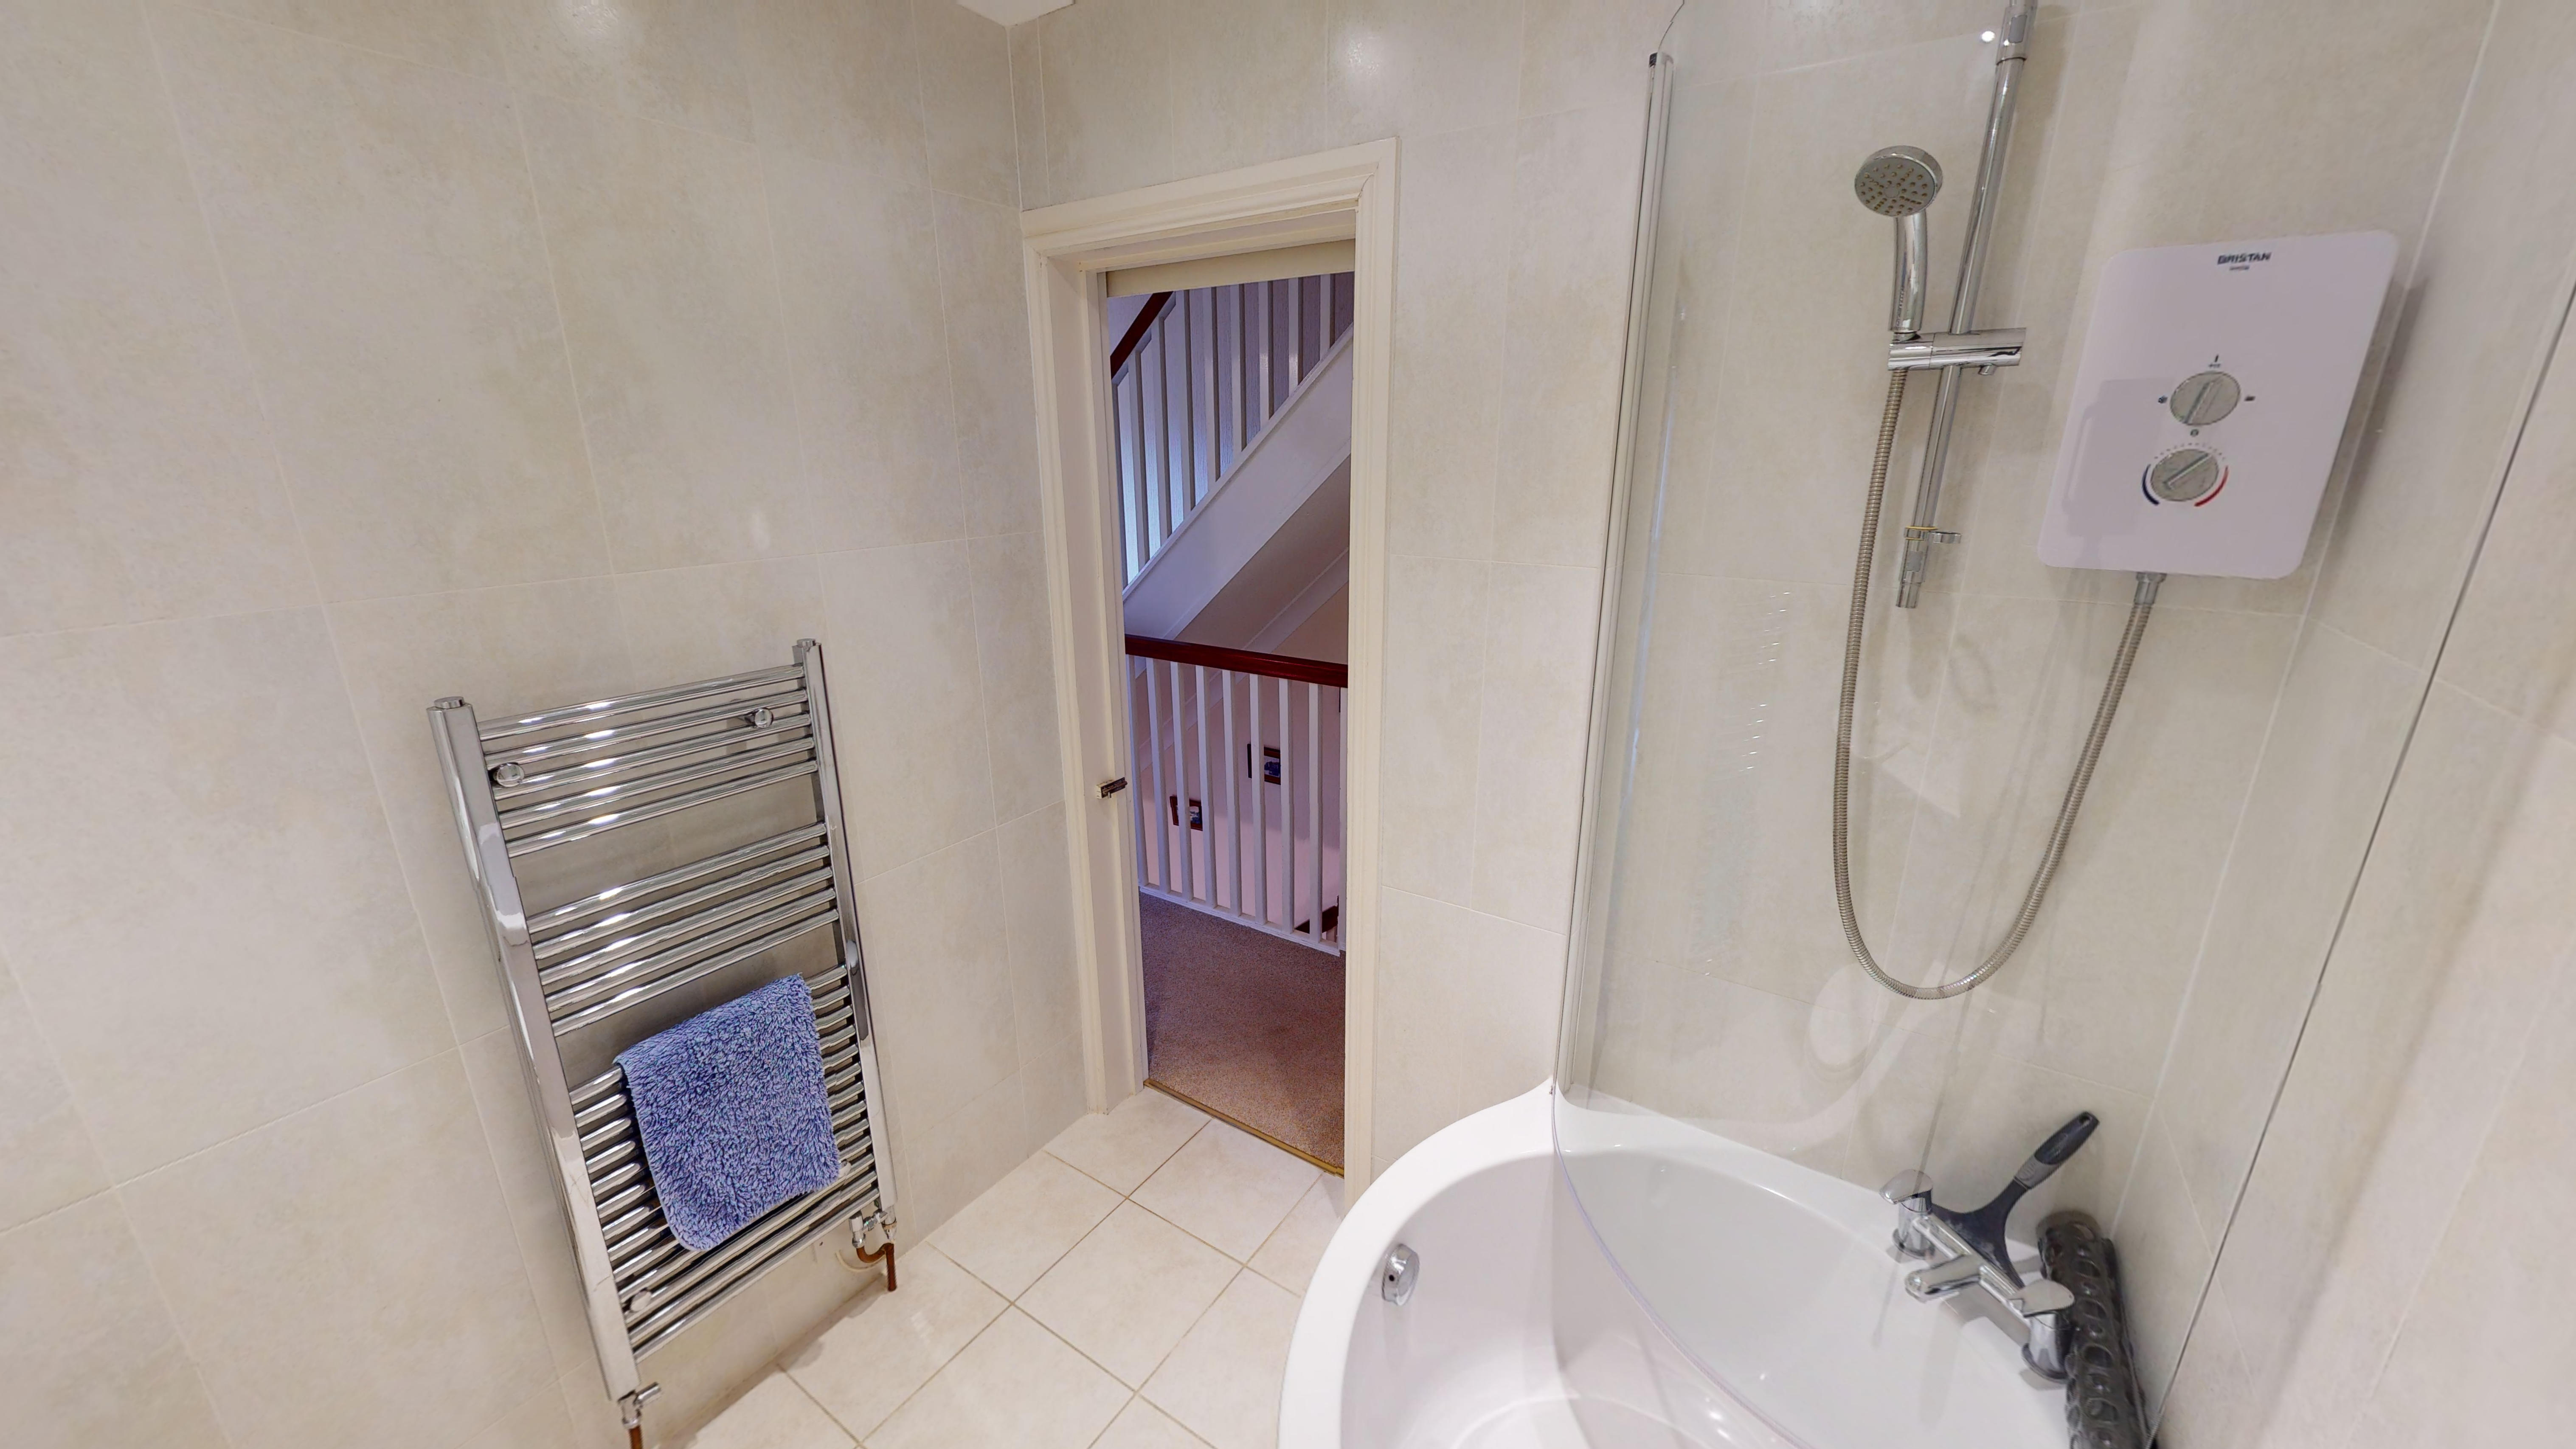 Lakes Court 03032020 211852 Bathroom